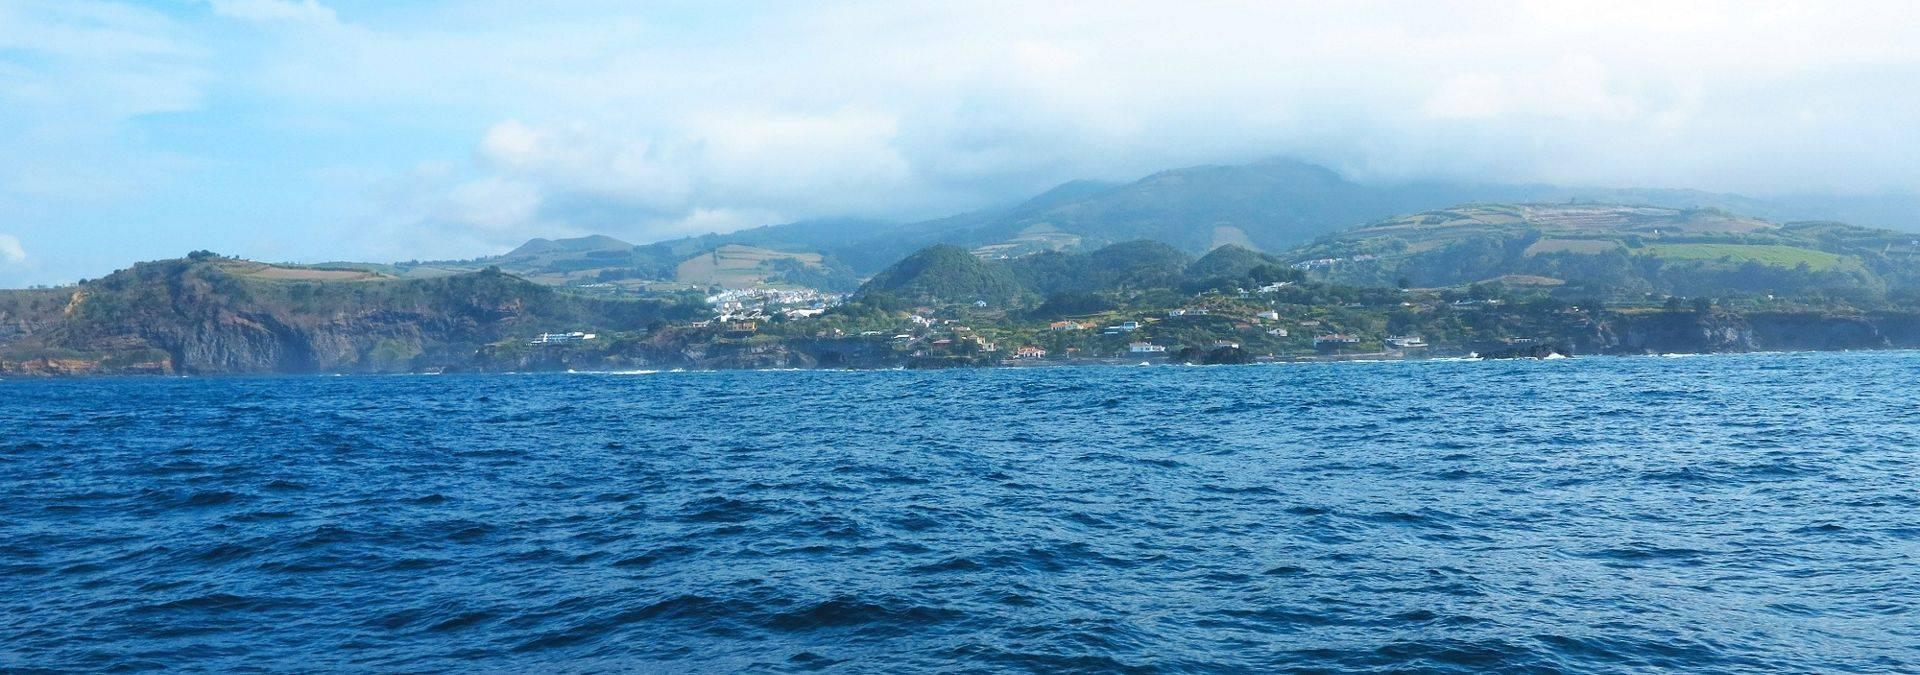 Sao Miguel Island Coast  AntóNio Carvalho E Cunha   Resize